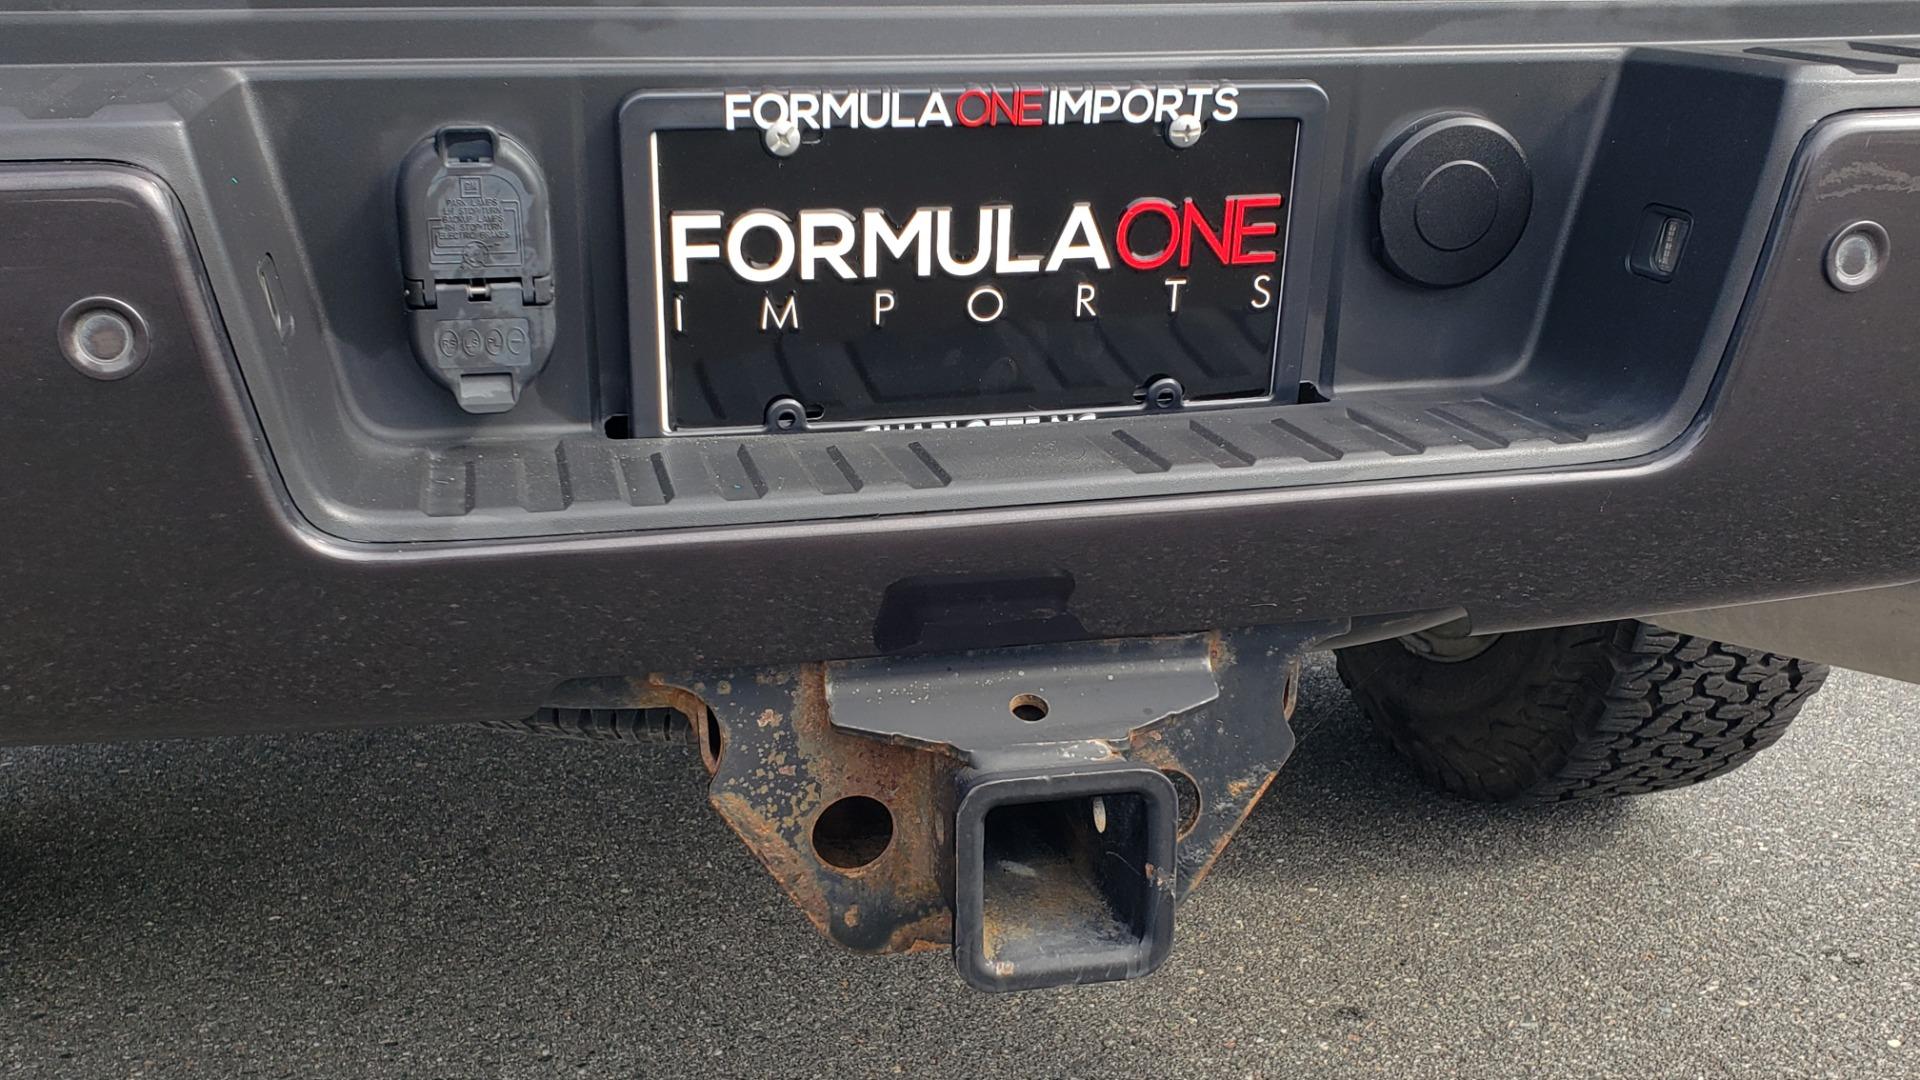 Used 2015 GMC SIERRA 2500HD DENALI / WIFI / NAV / DURAMAX PLUS / DRVR ALERT / SUNROOF / REARVIEW for sale $56,995 at Formula Imports in Charlotte NC 28227 27